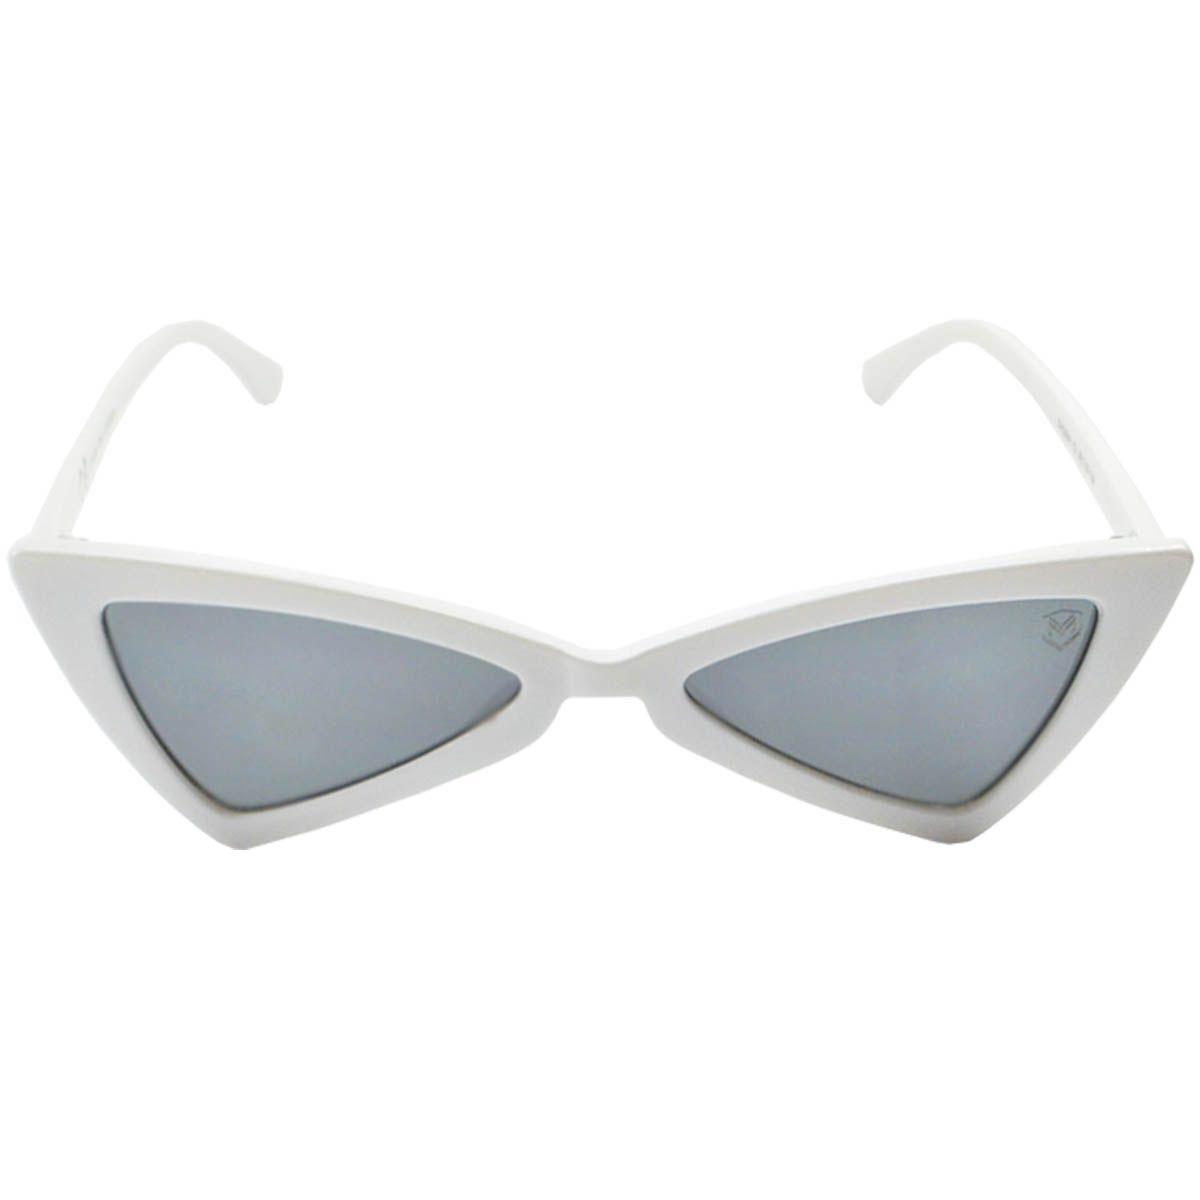 Óculos de Sol Feminino Triangular Mackage MK8841